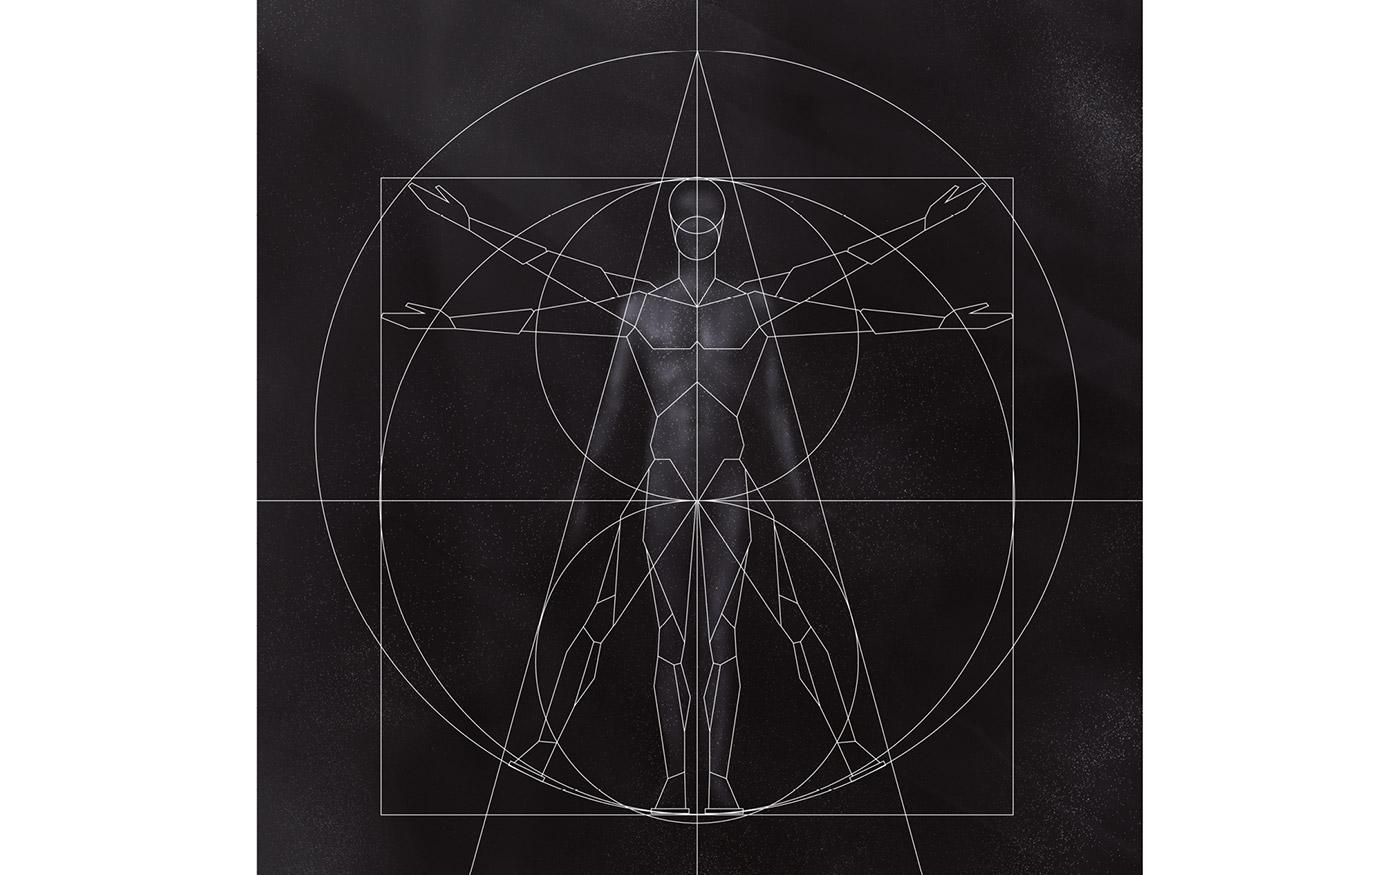 der-getreue-roboter-illustration-perfekter-mensch